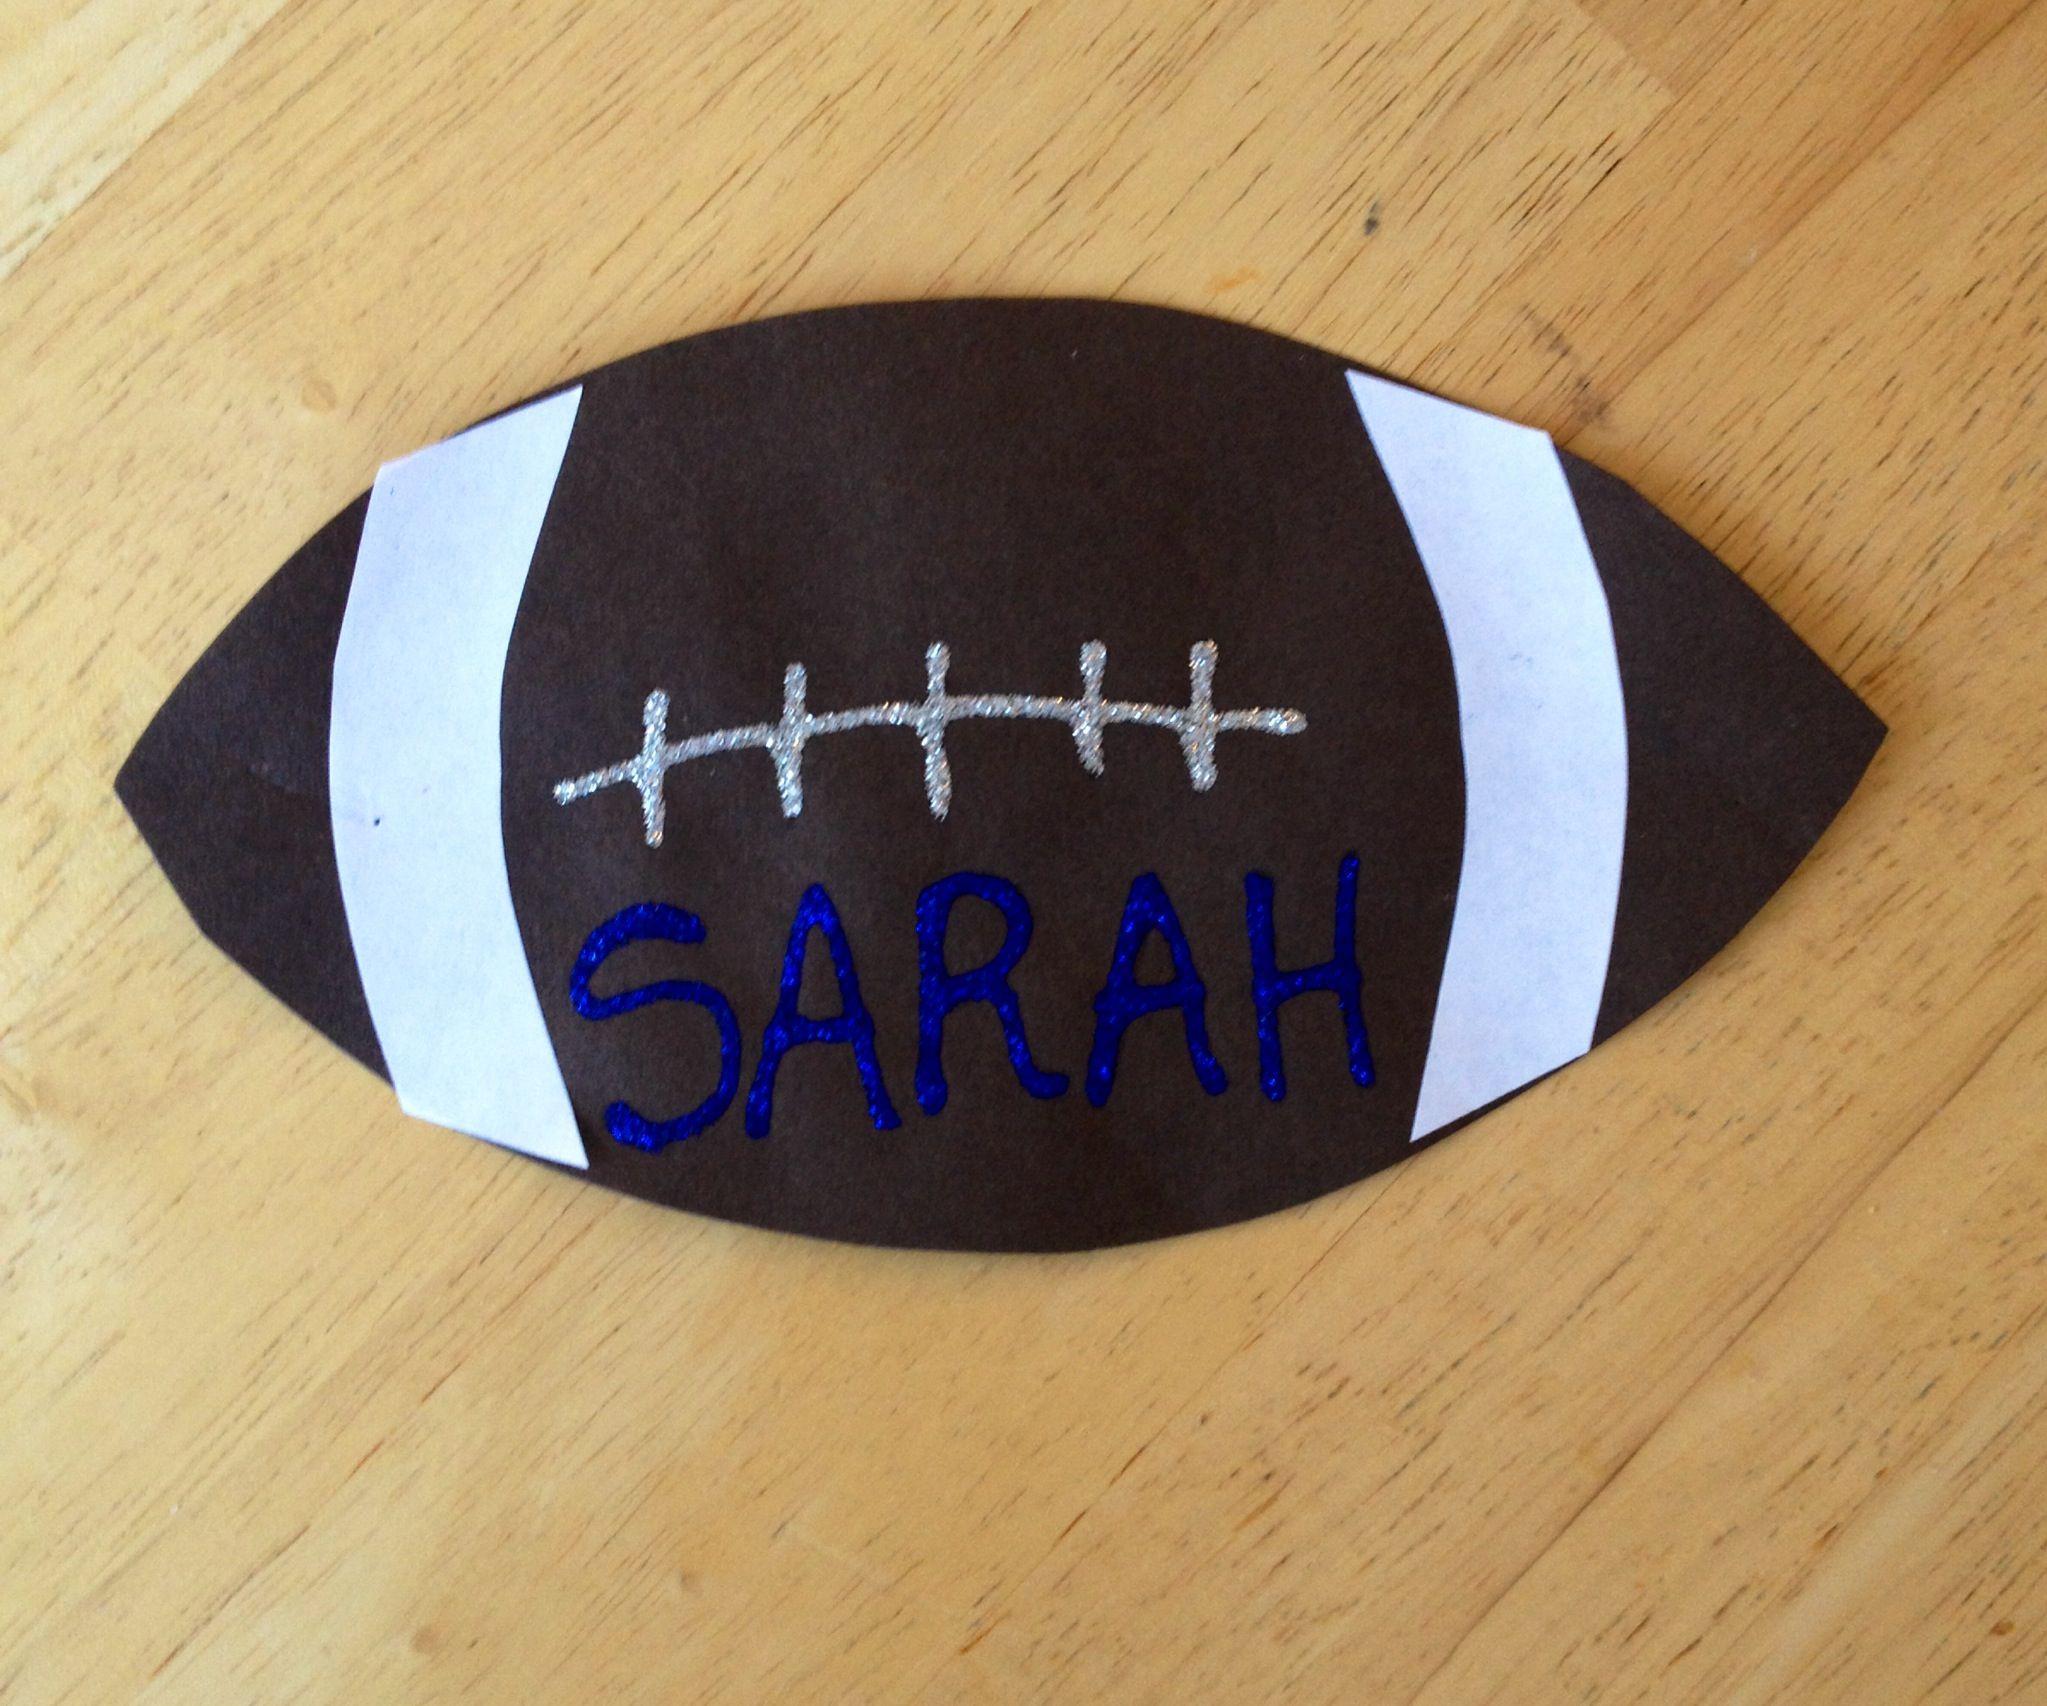 Sarah 39 s football craft kidscrafts preschool activities for Football crafts for preschoolers